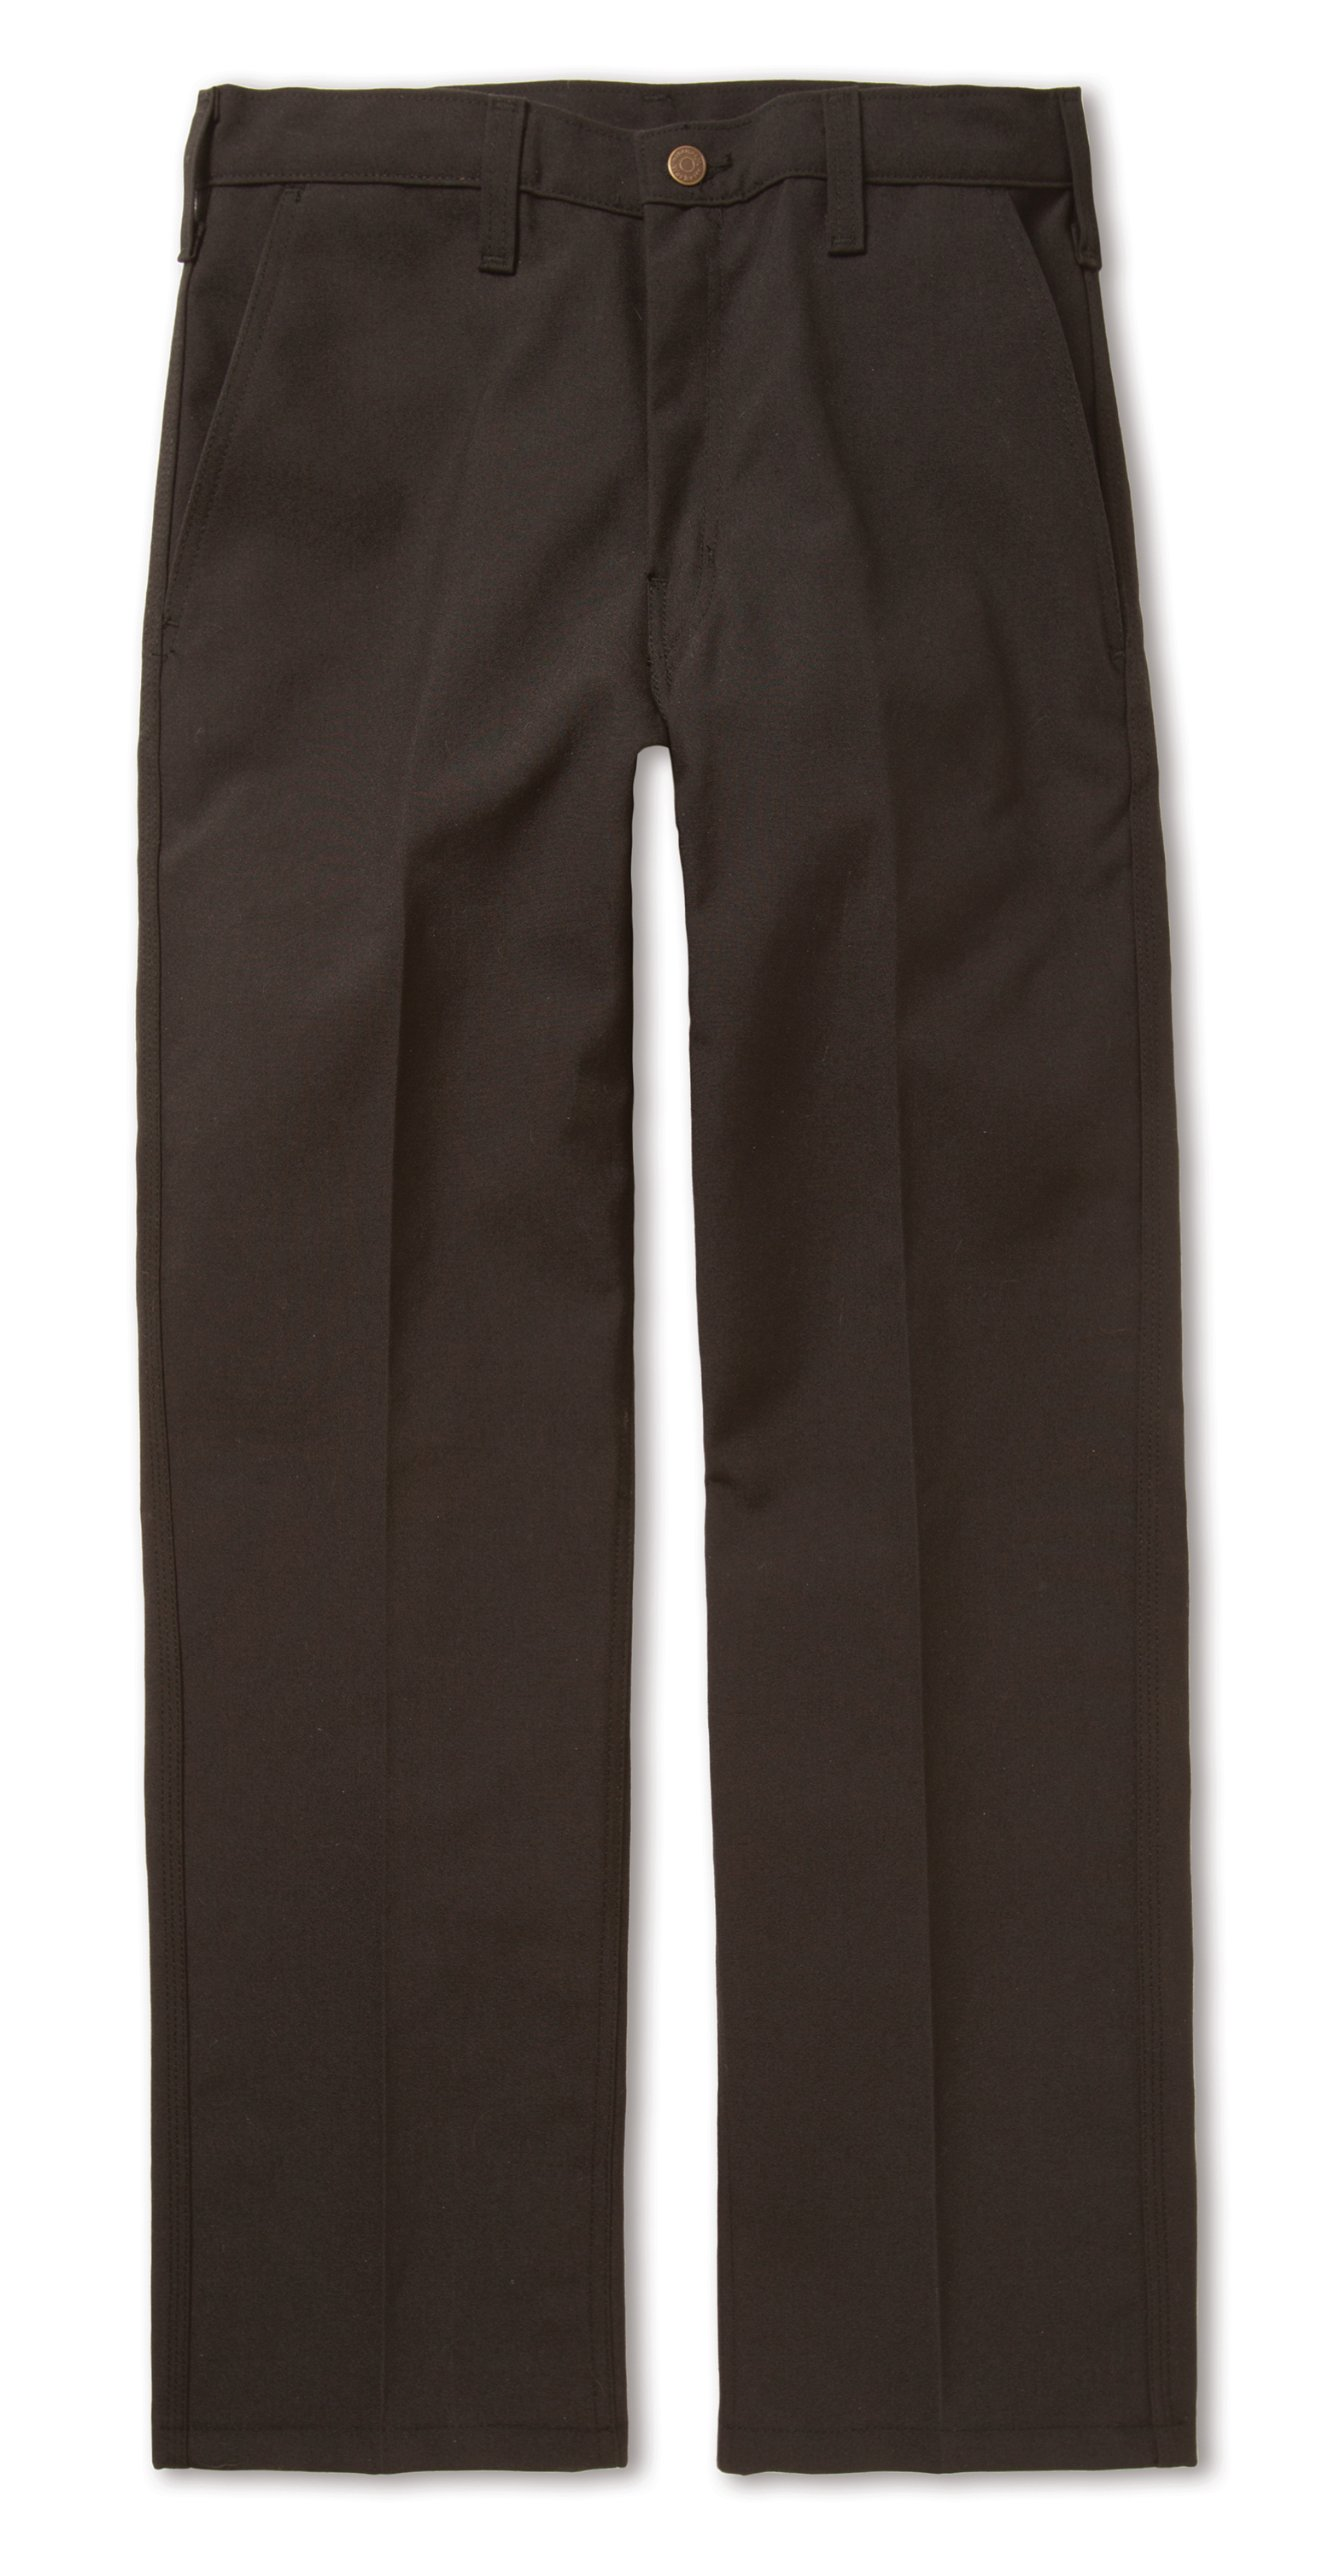 Workrite 402NX75BK36-34 Flame Resistant 7.5 oz Nomex IIIA Full-Cut Industrial Pant, 36 Waist Size, 34 Inseam, Black